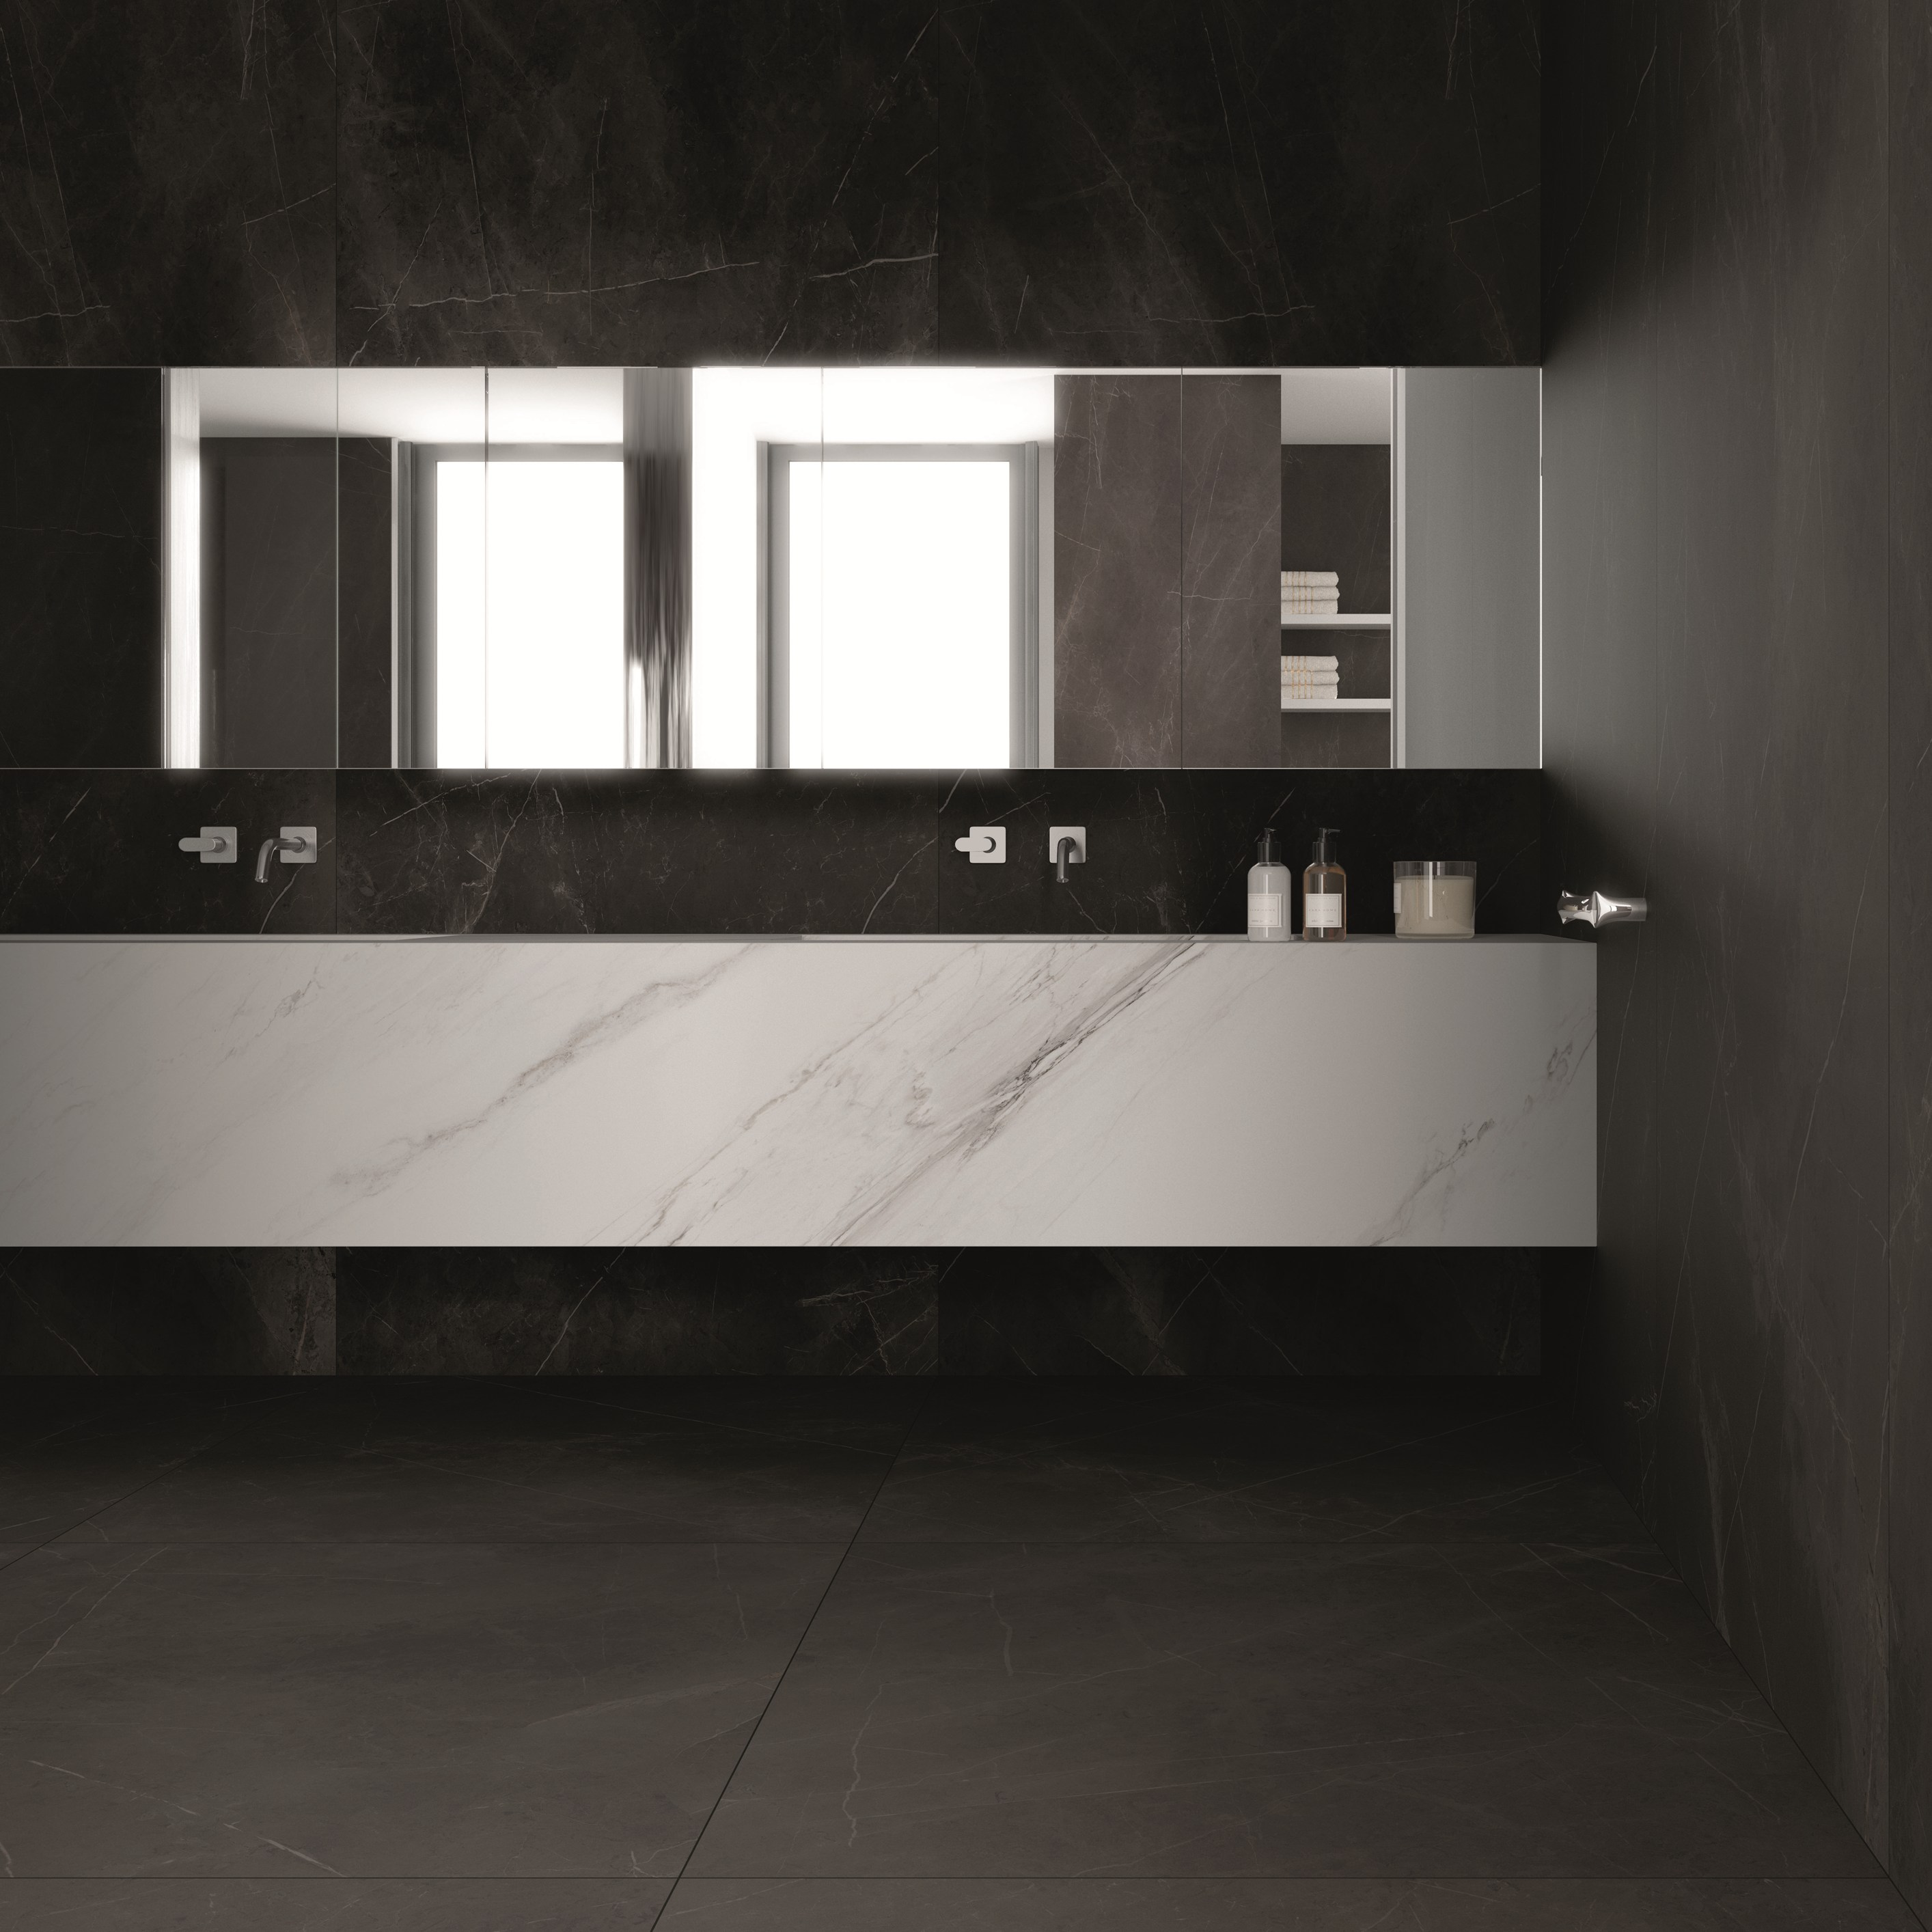 STORM-Porcelain-stoneware-wall-floor-tiles-INALCO-INDUSTRIAS-ALCORENSES-CONFEDERADAS-270488-relc890d